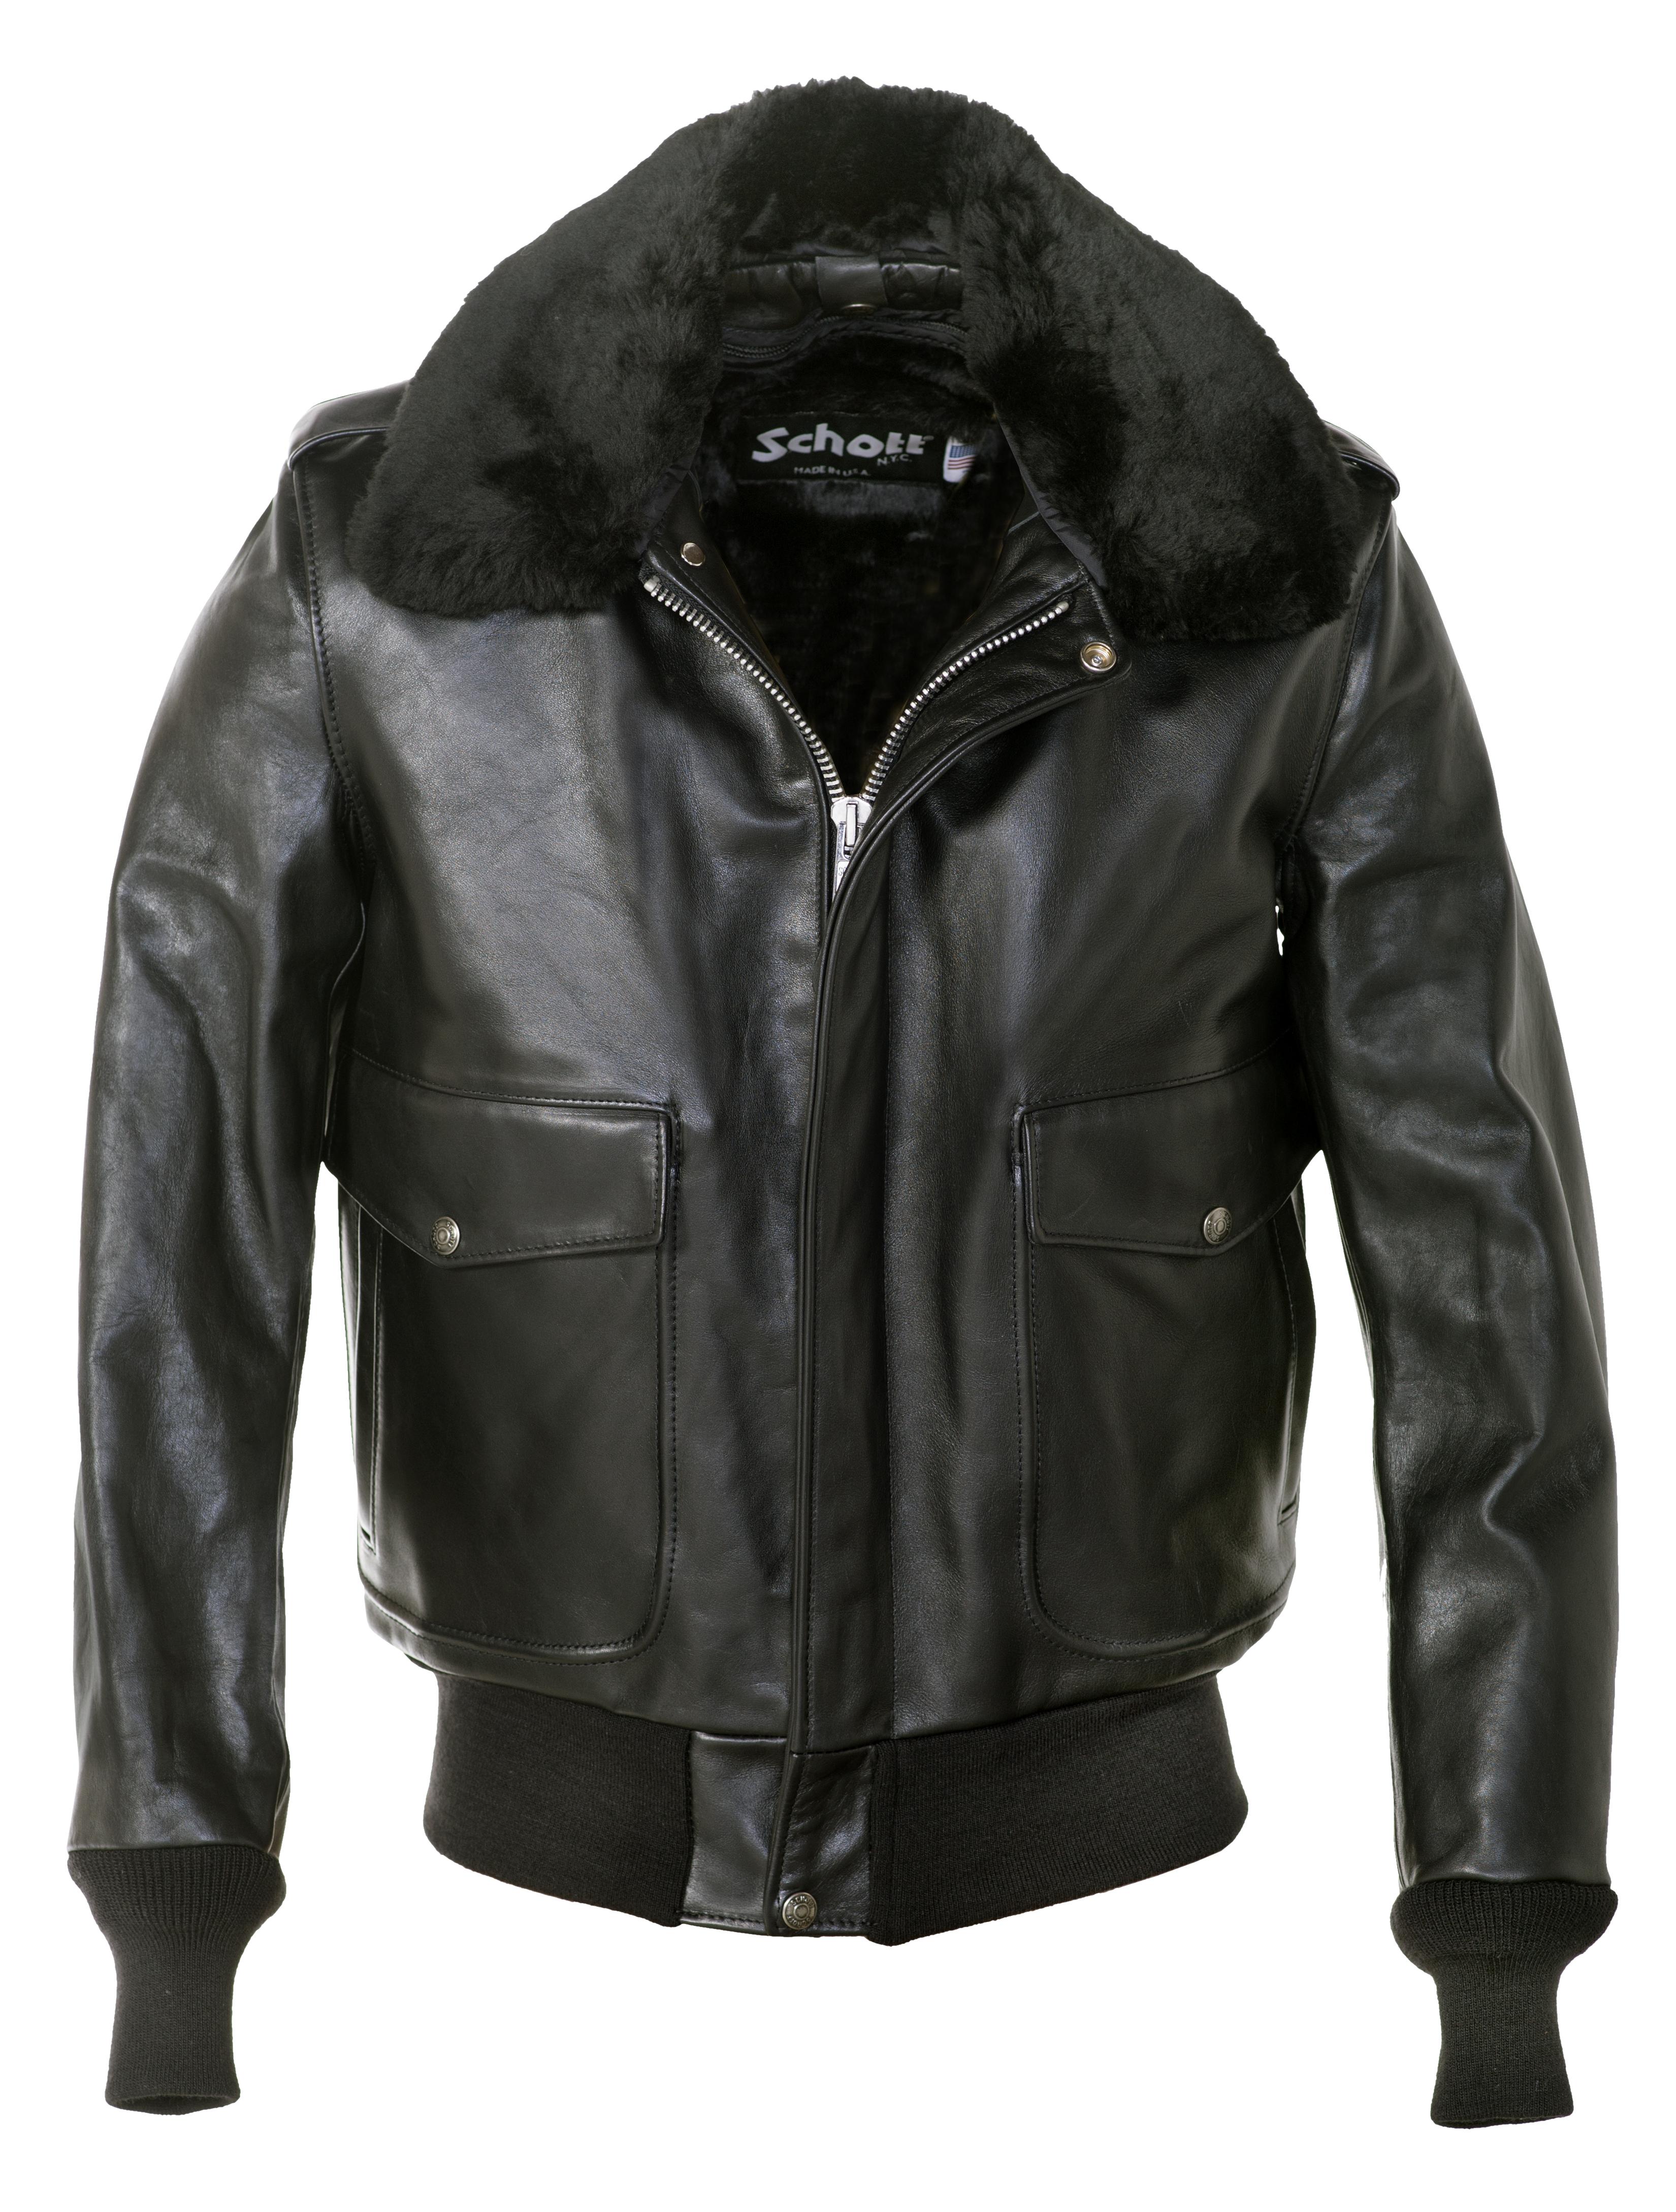 Schott N.Y.C. 184SM A-2 Naked Cowhide Leather Flight Jacket